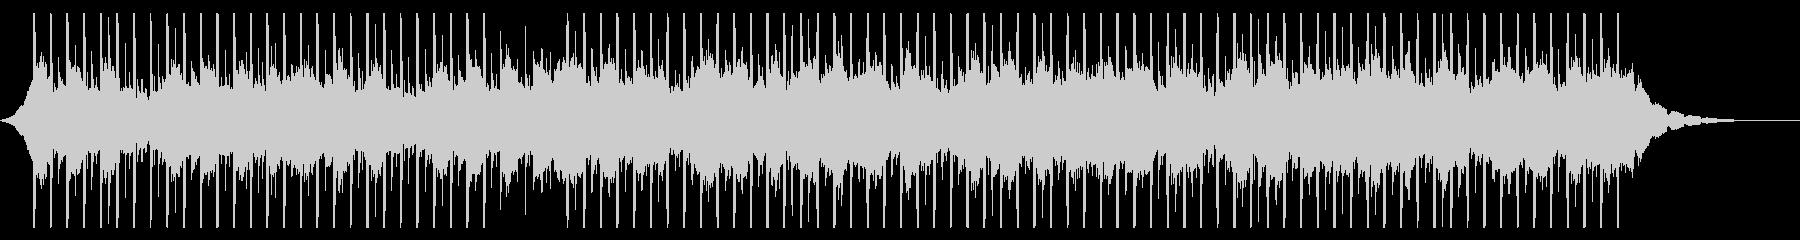 The Construction (60 Sec)'s unreproduced waveform